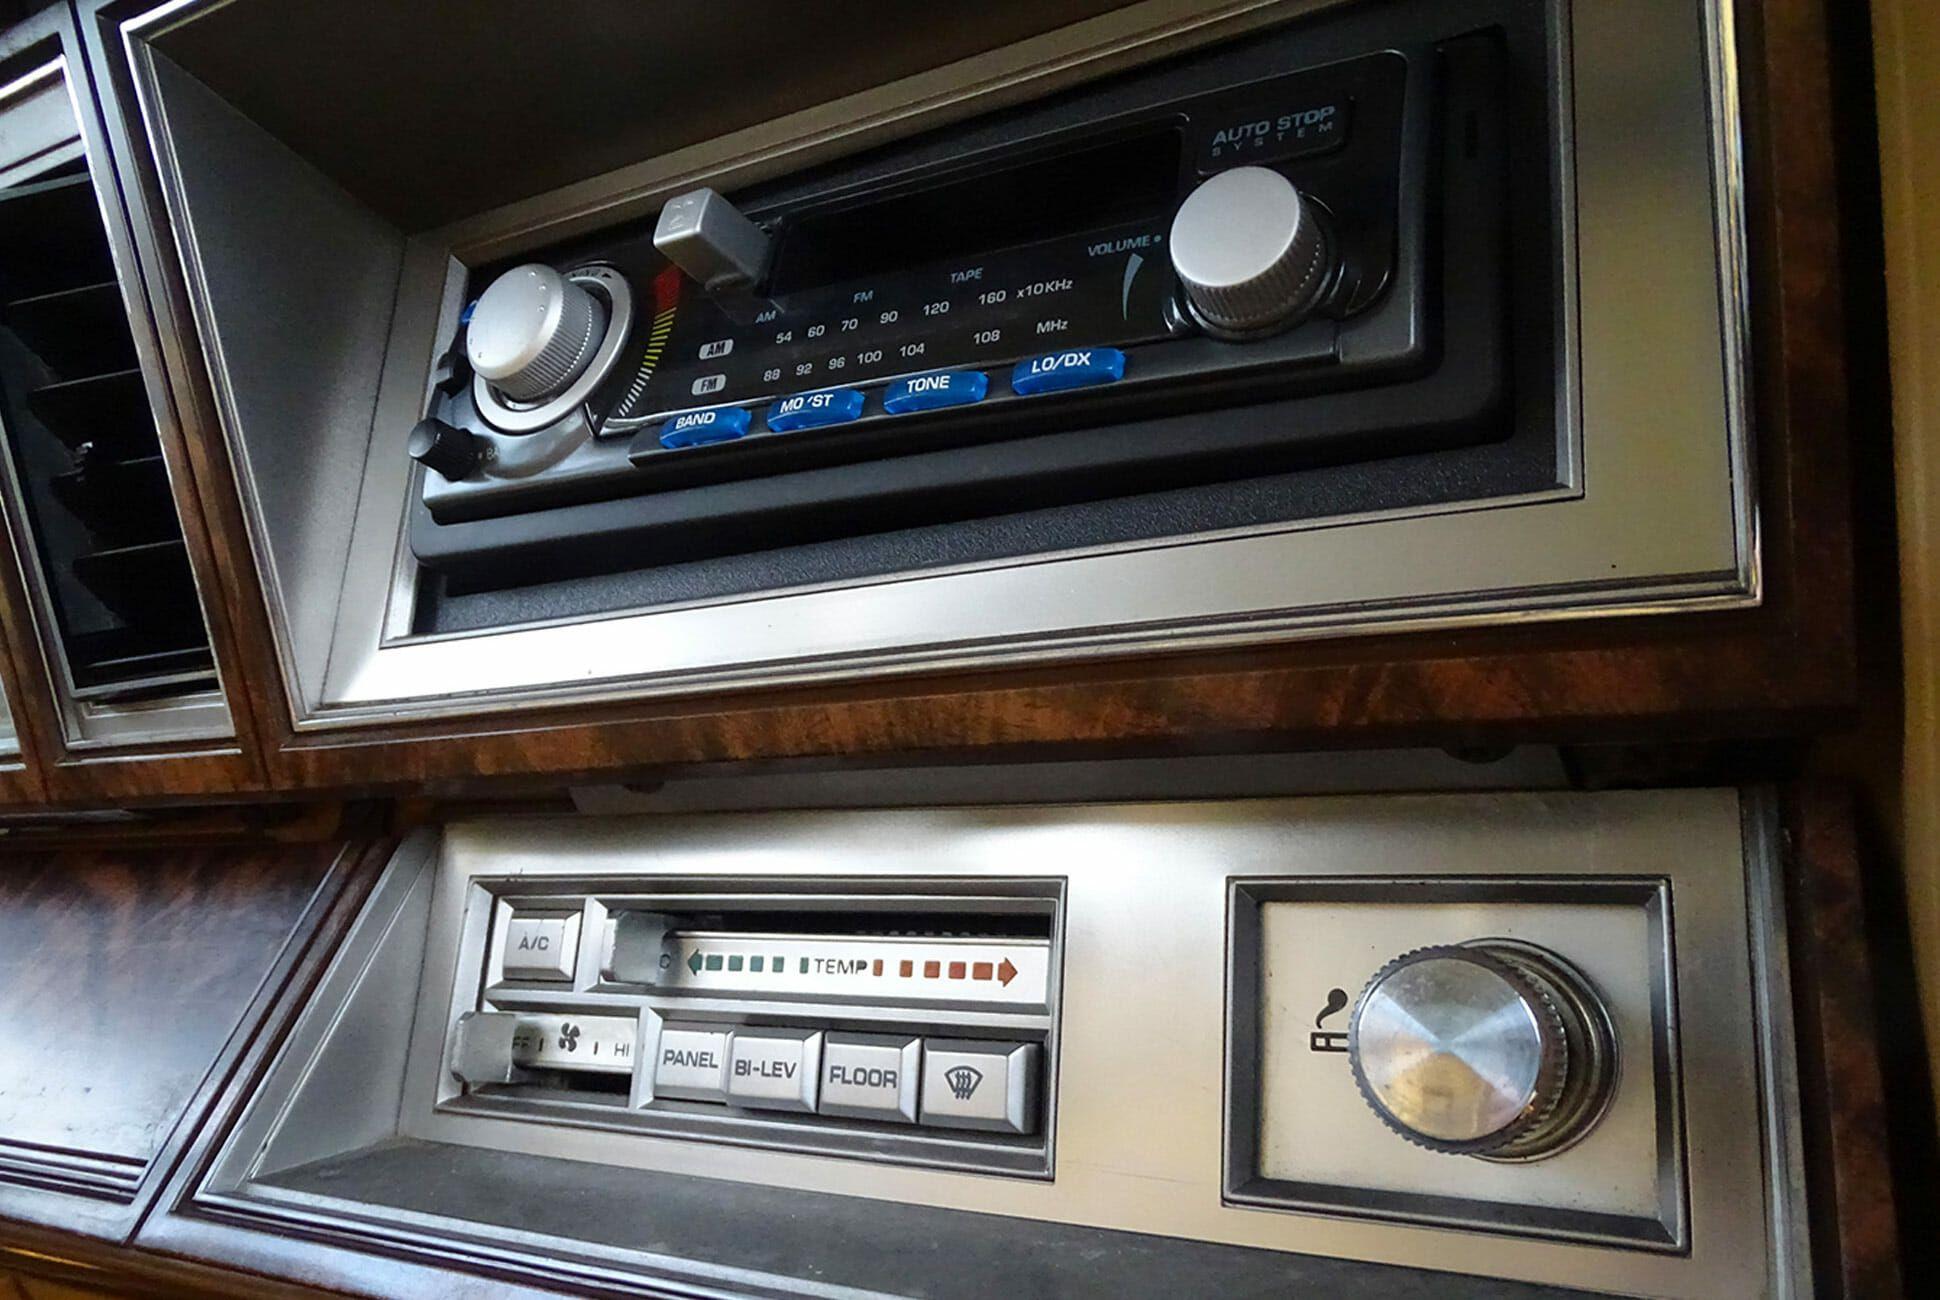 Frank-Sinatra-1985-Chrysler-LeBaron-gear-patrol-slide-6